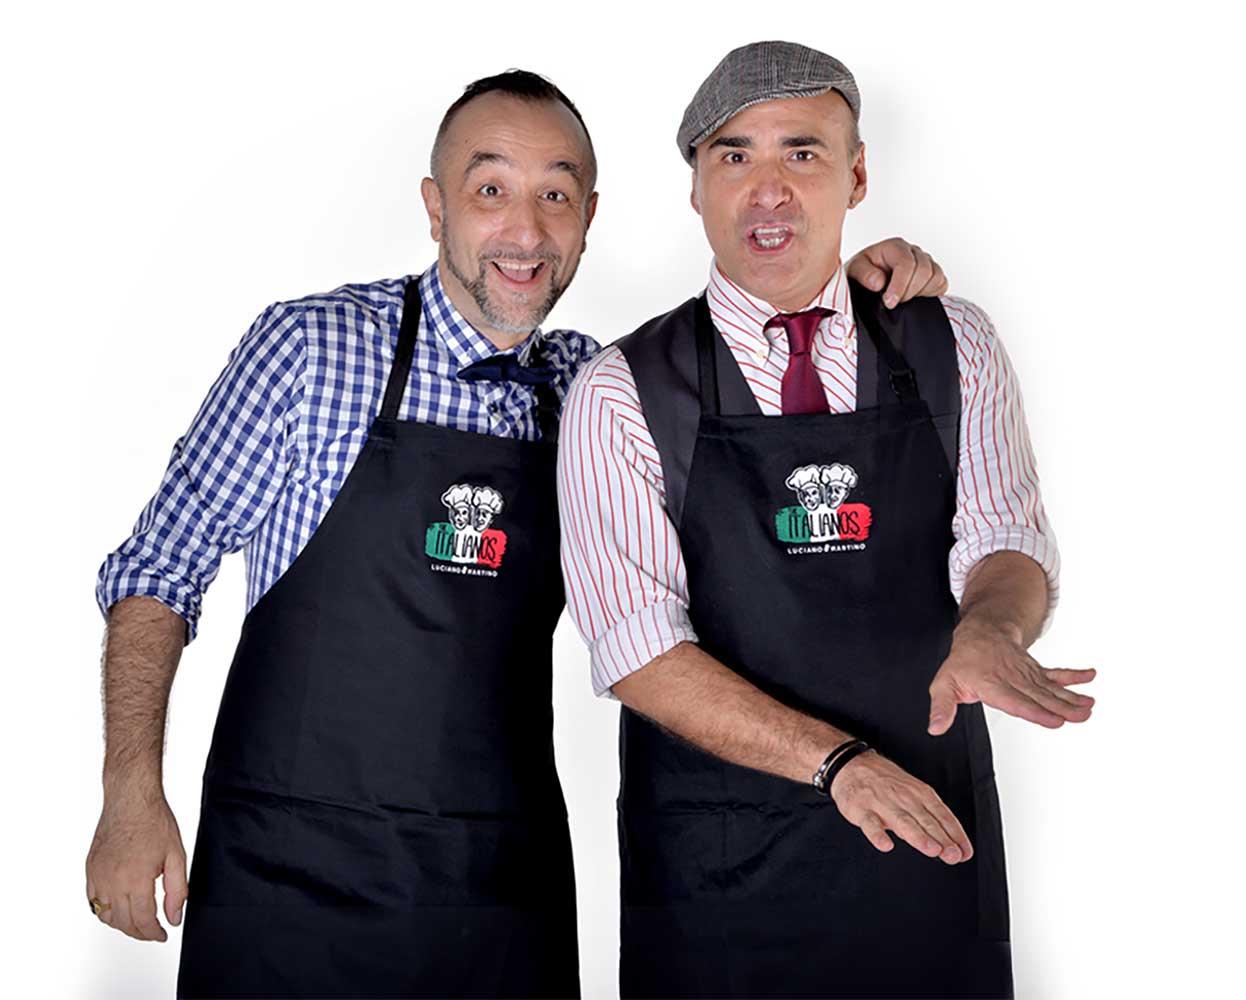 The Italianos branding -apparel